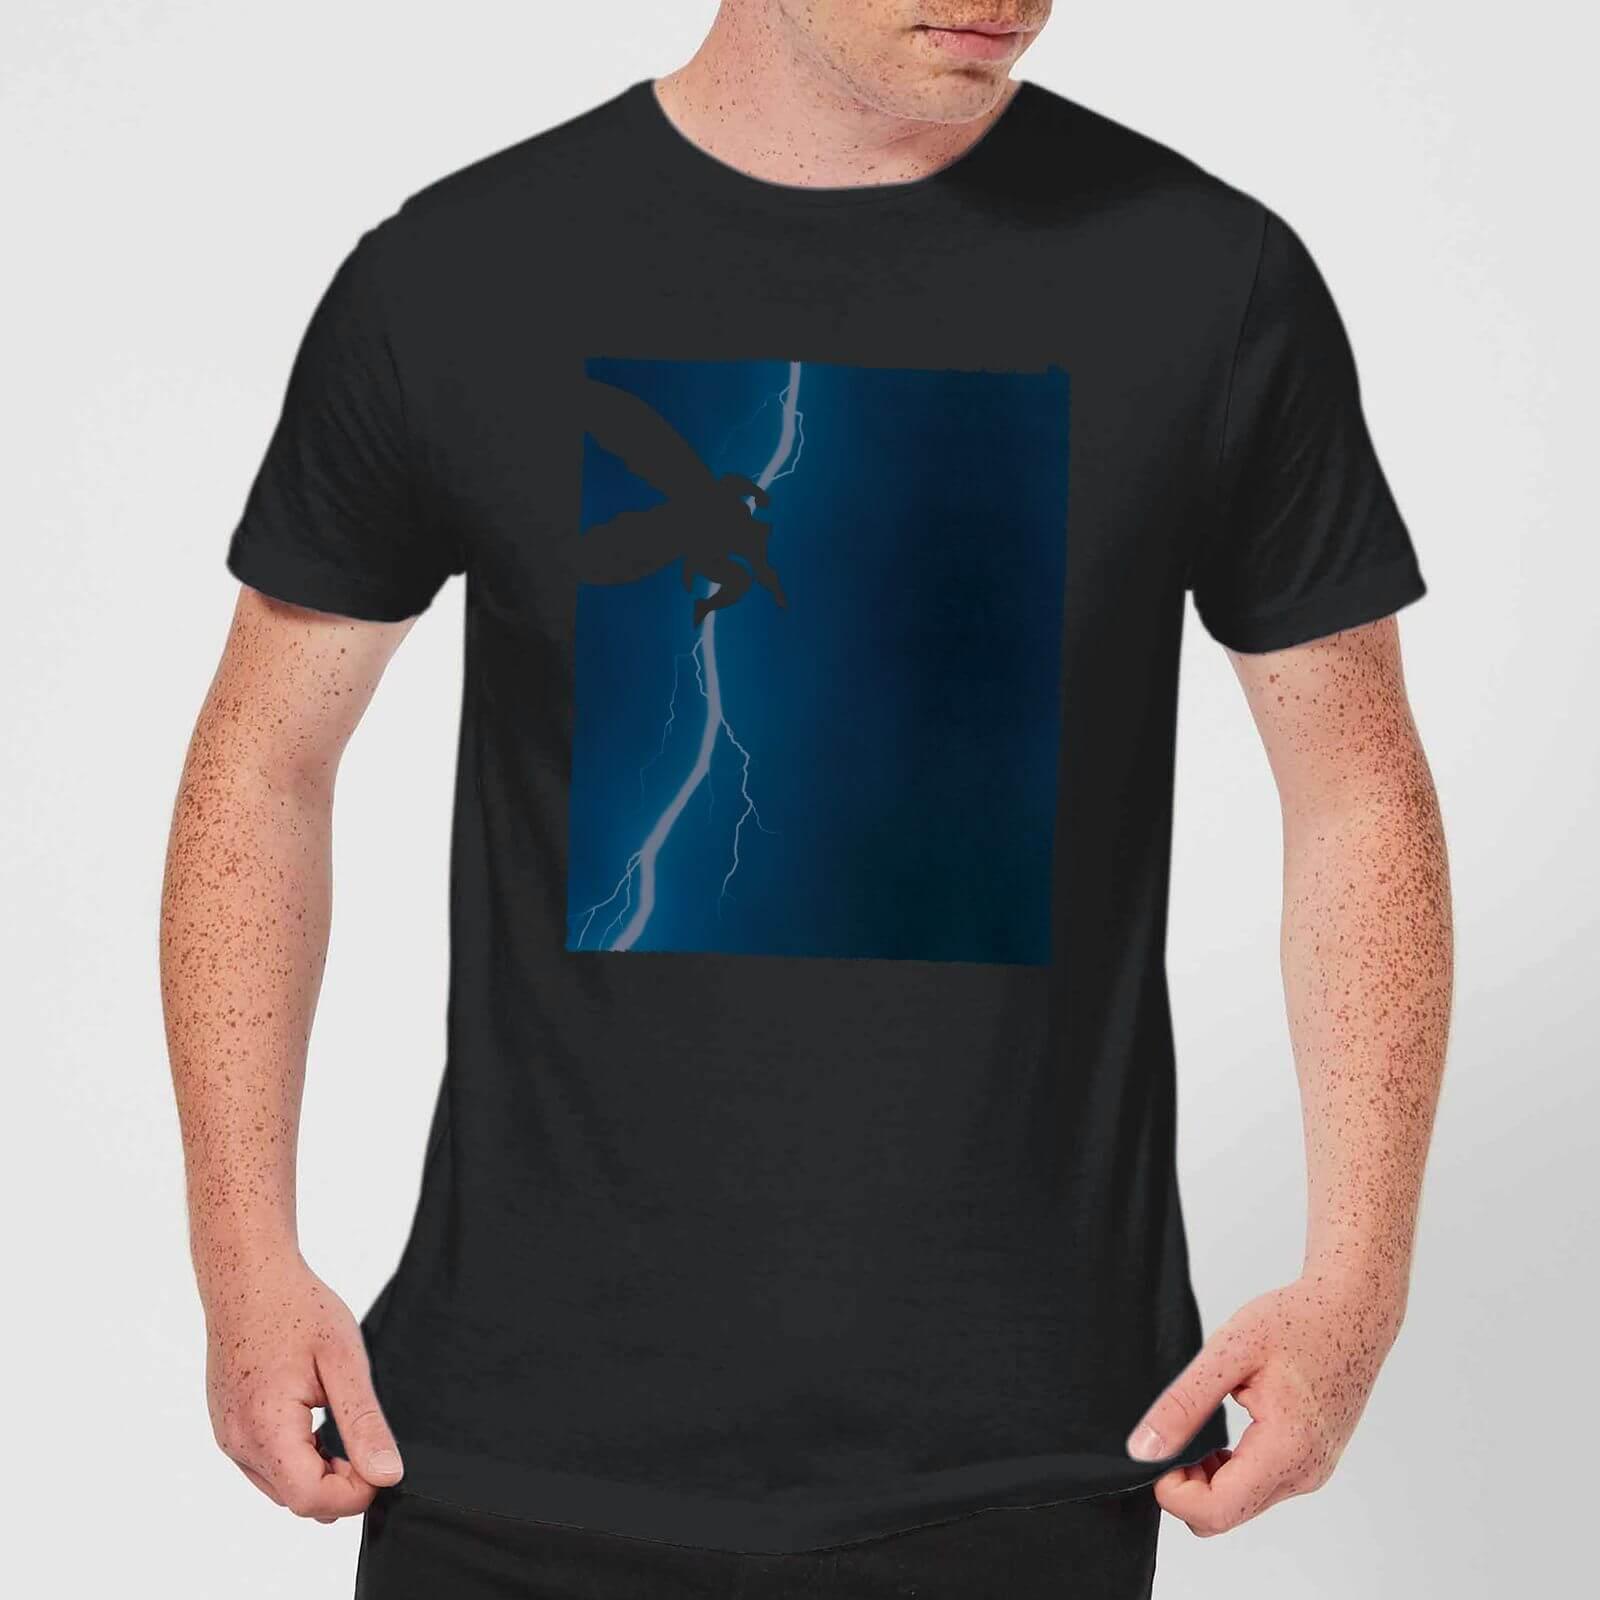 Batman The Dark Knight Returns Cover Men's T-Shirt - Black - 5XL - Schwarz